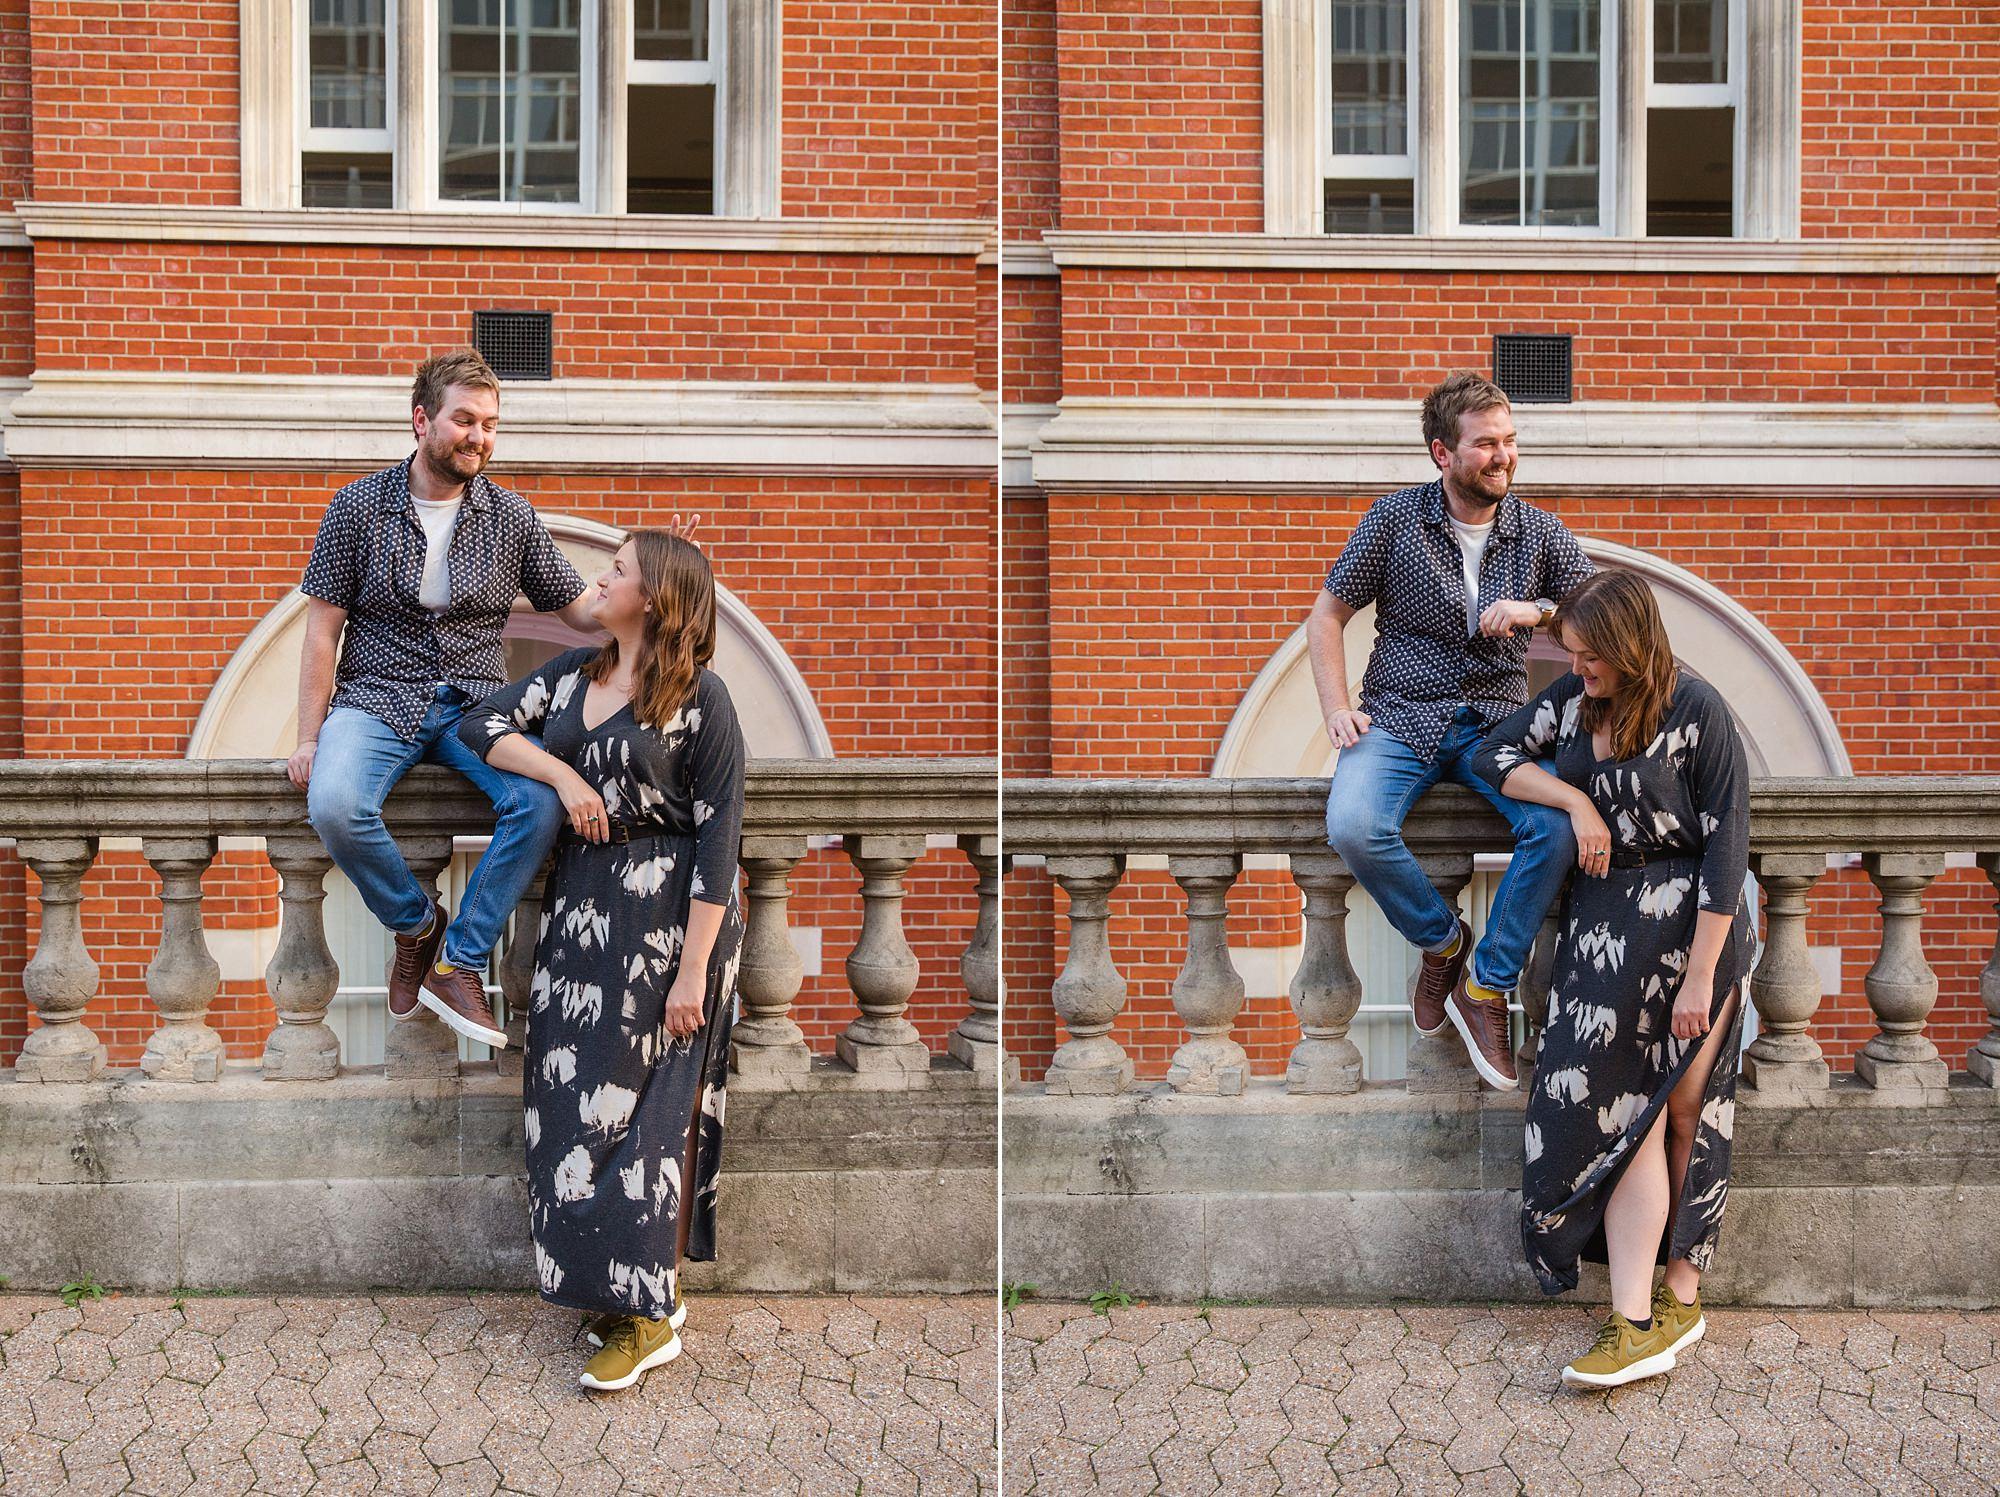 Croydon engagement photography portrait of groom giving bride bunny ears